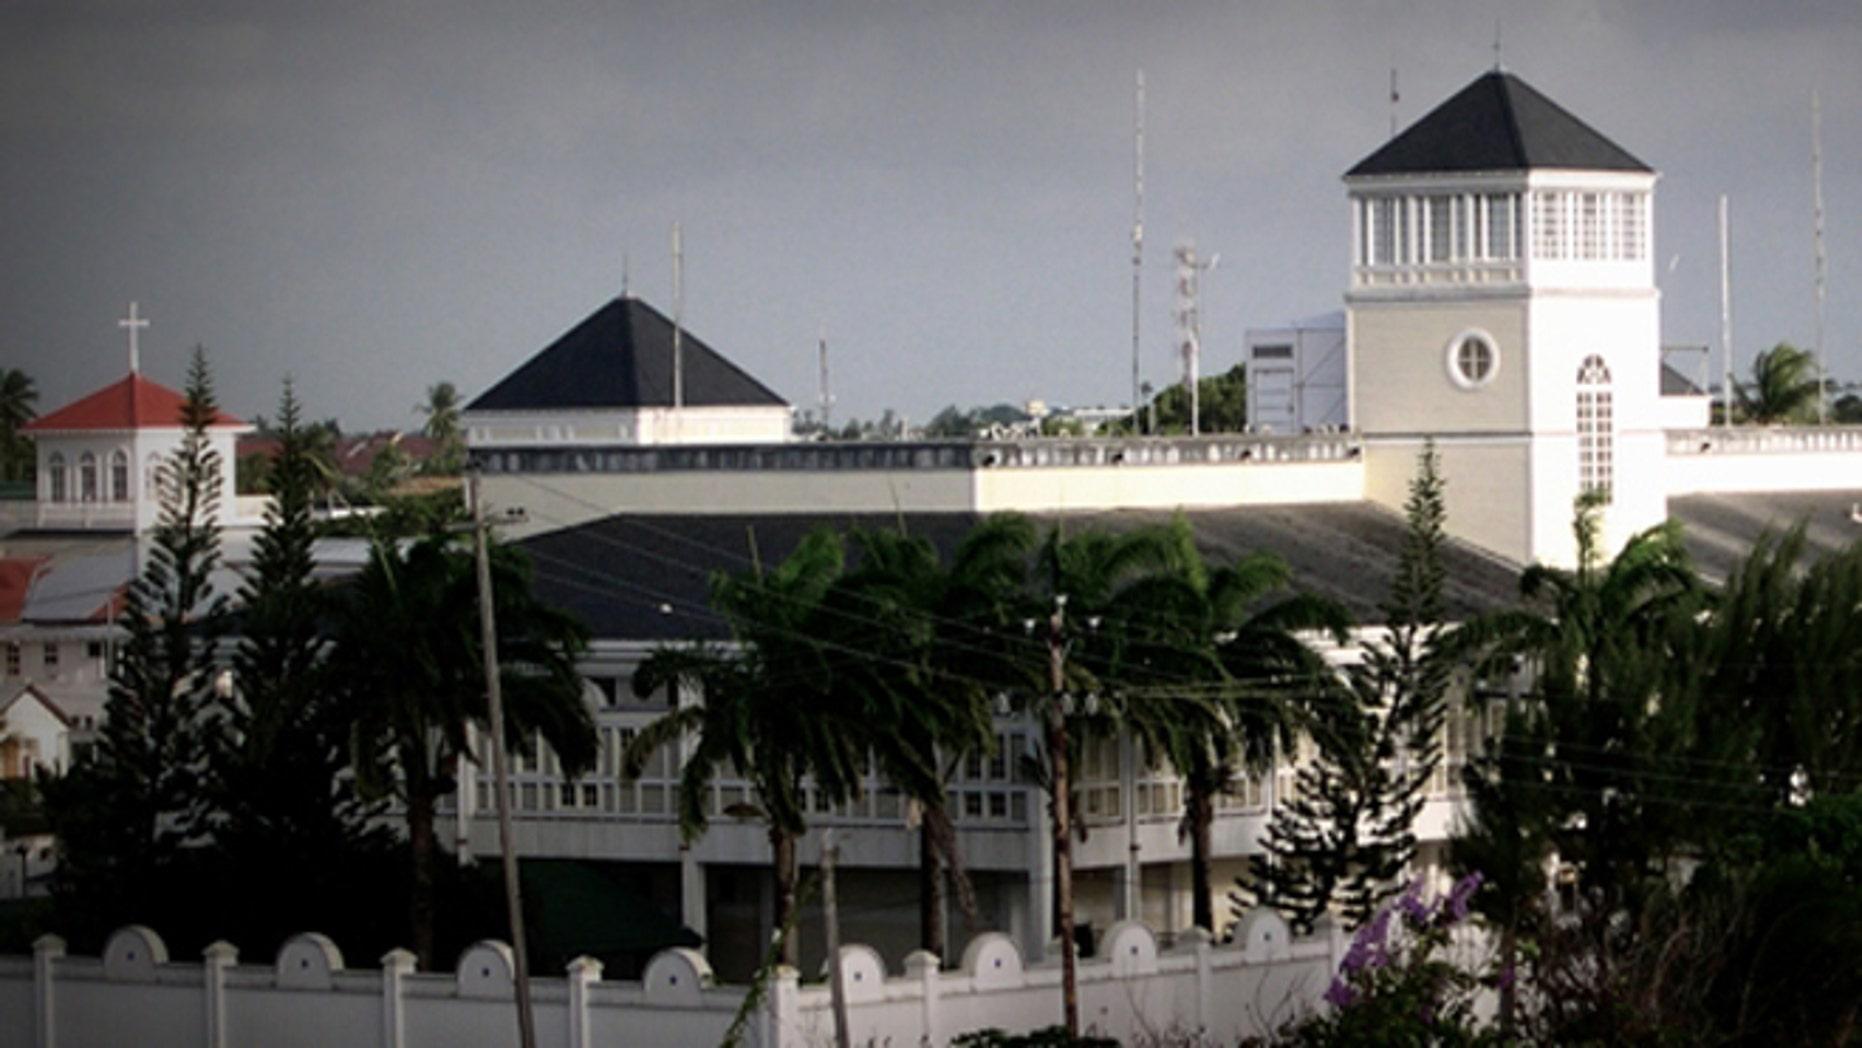 Shown here is the U.S. Embassy in Georgetown, Guyana.